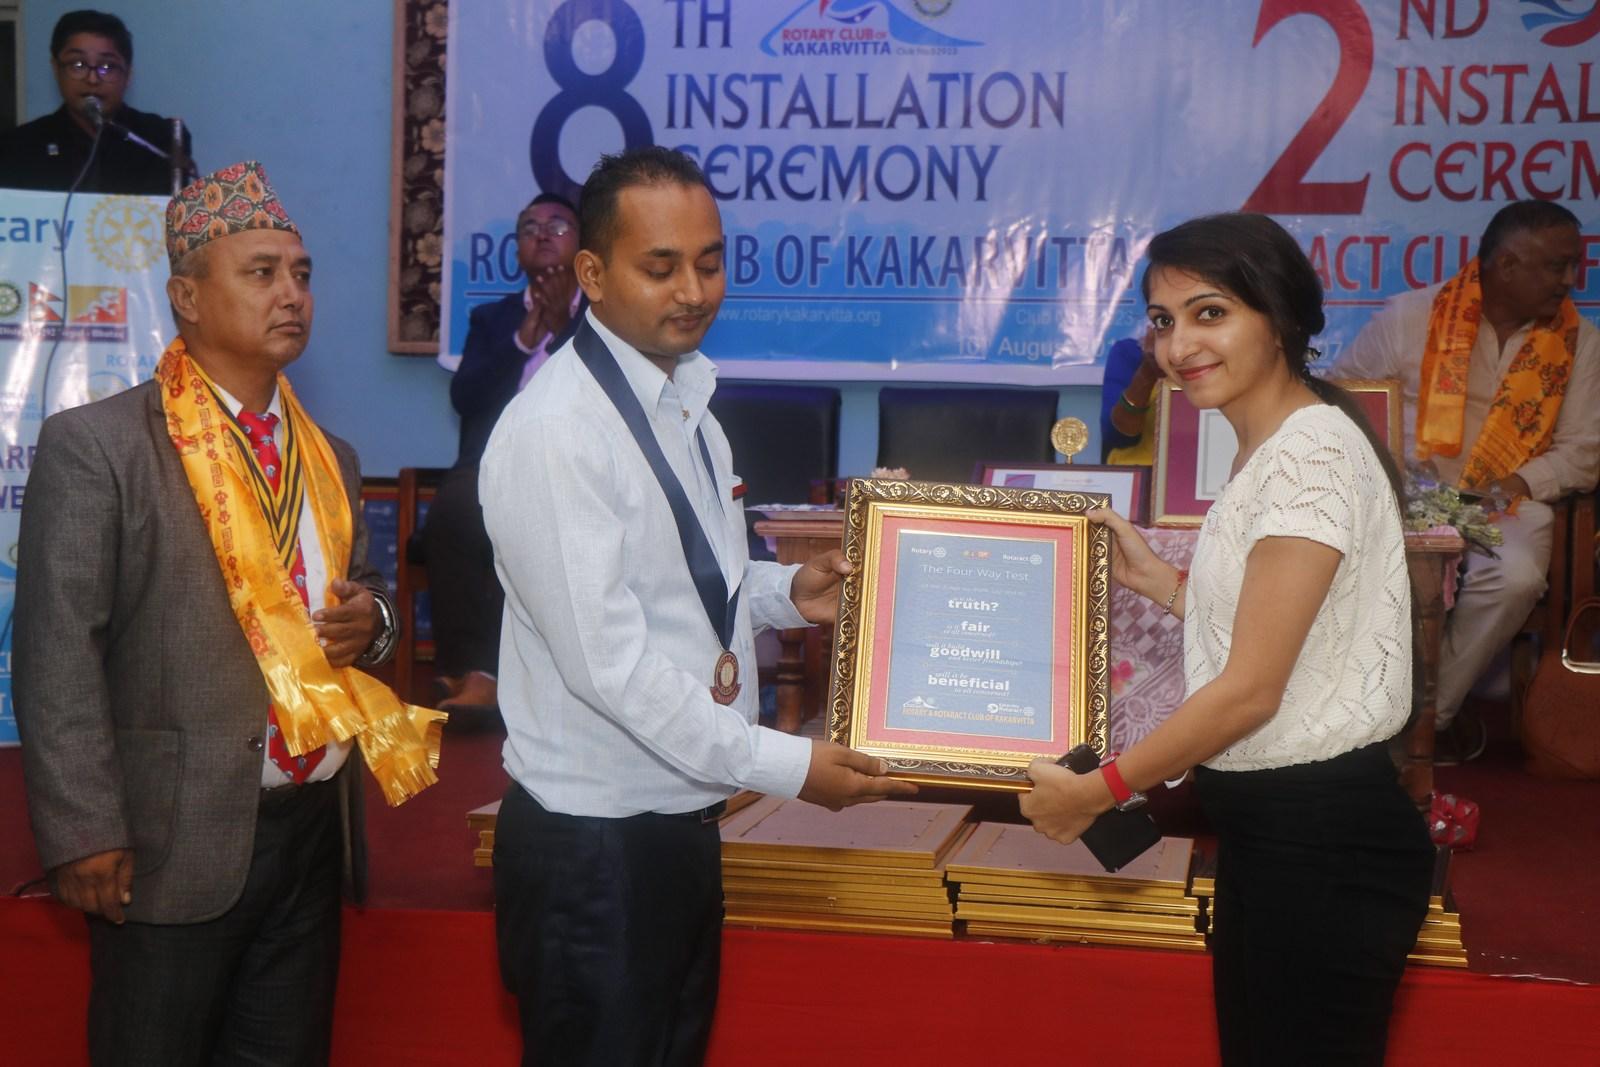 8th-Installation-Ceremony-Rotary-Club-of-Kakarvitta-100